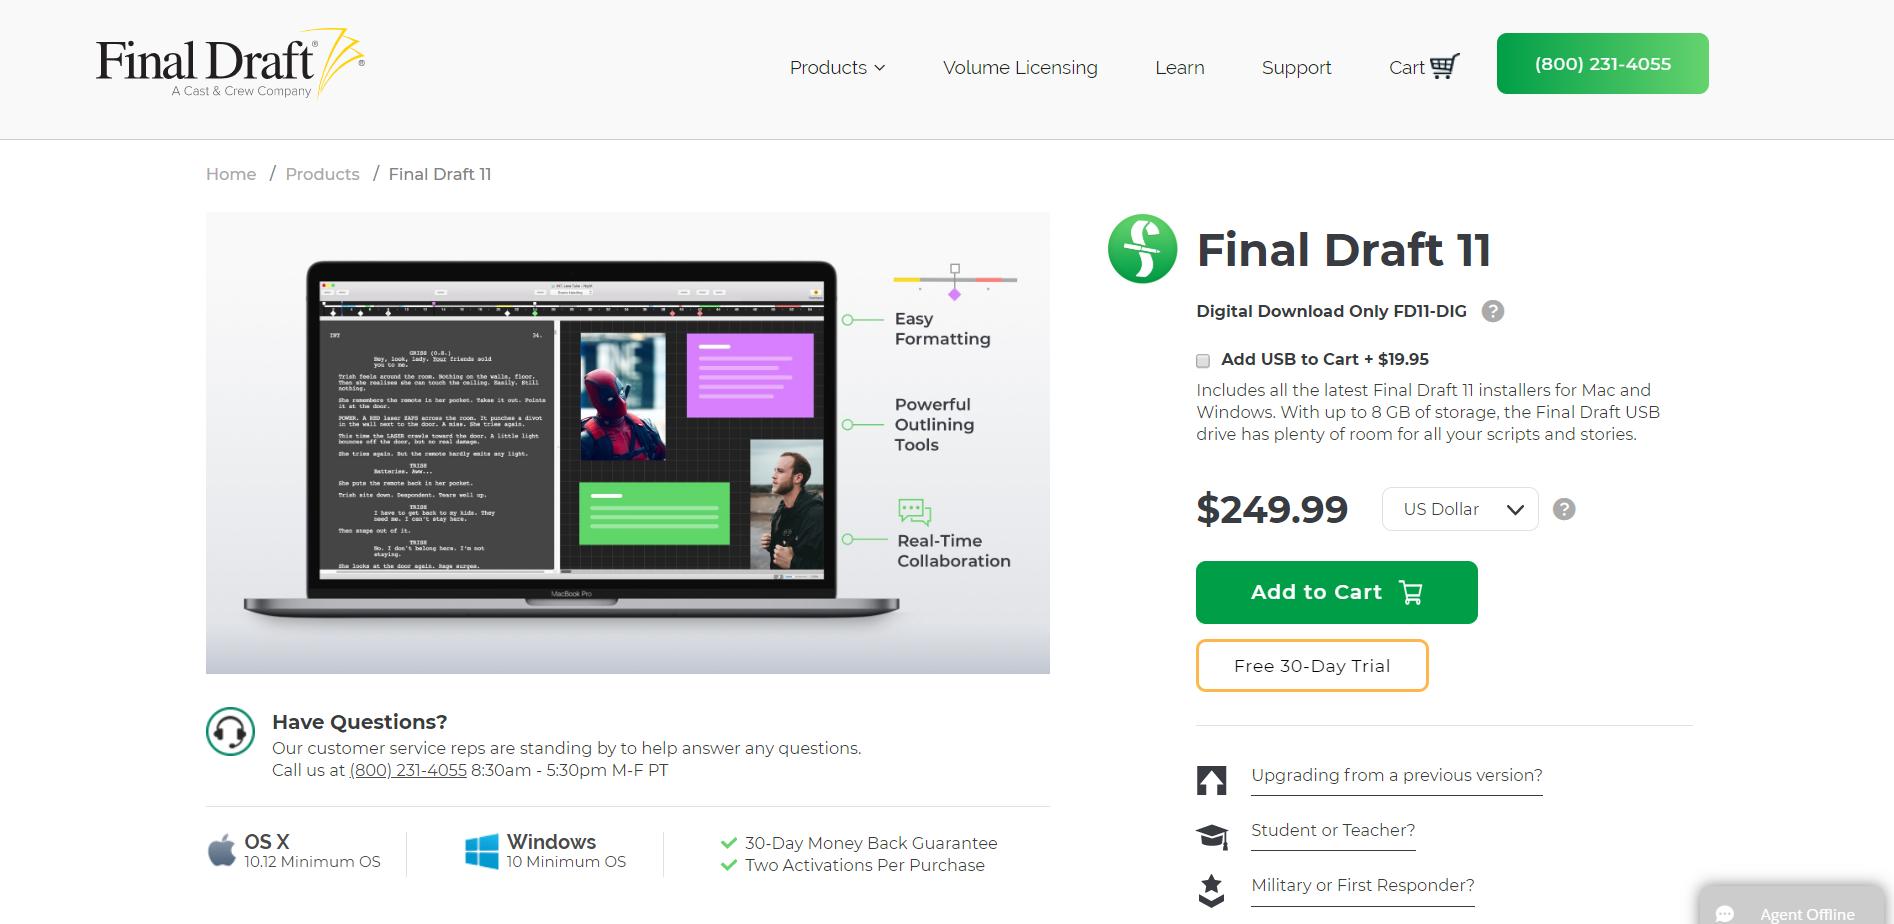 ecommerce-design-principles-final-draft